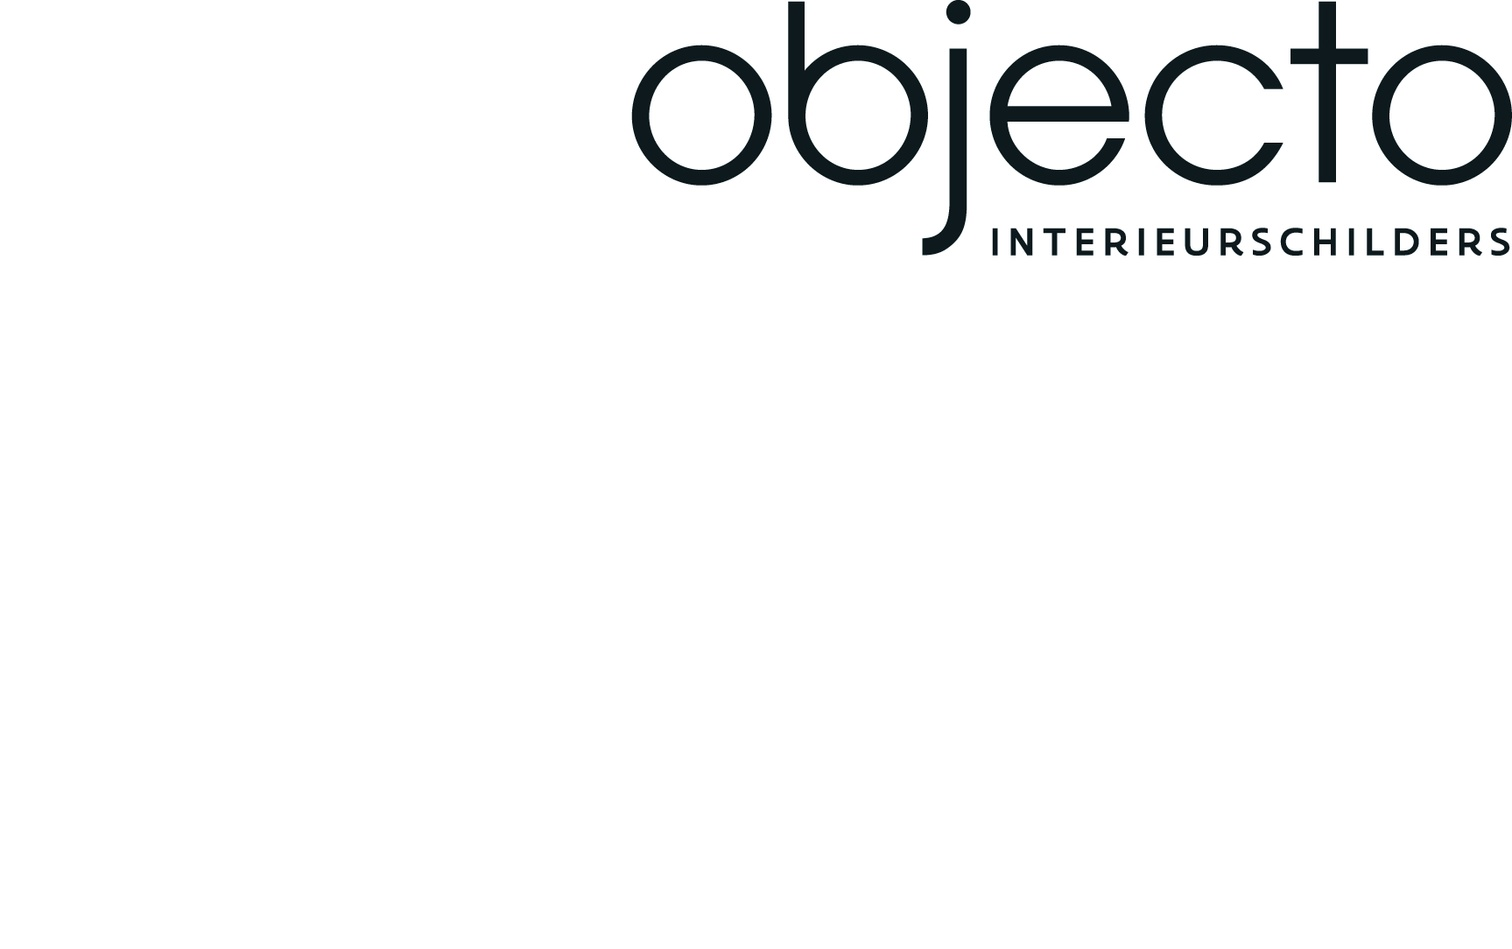 logo Objecto interieurschilders